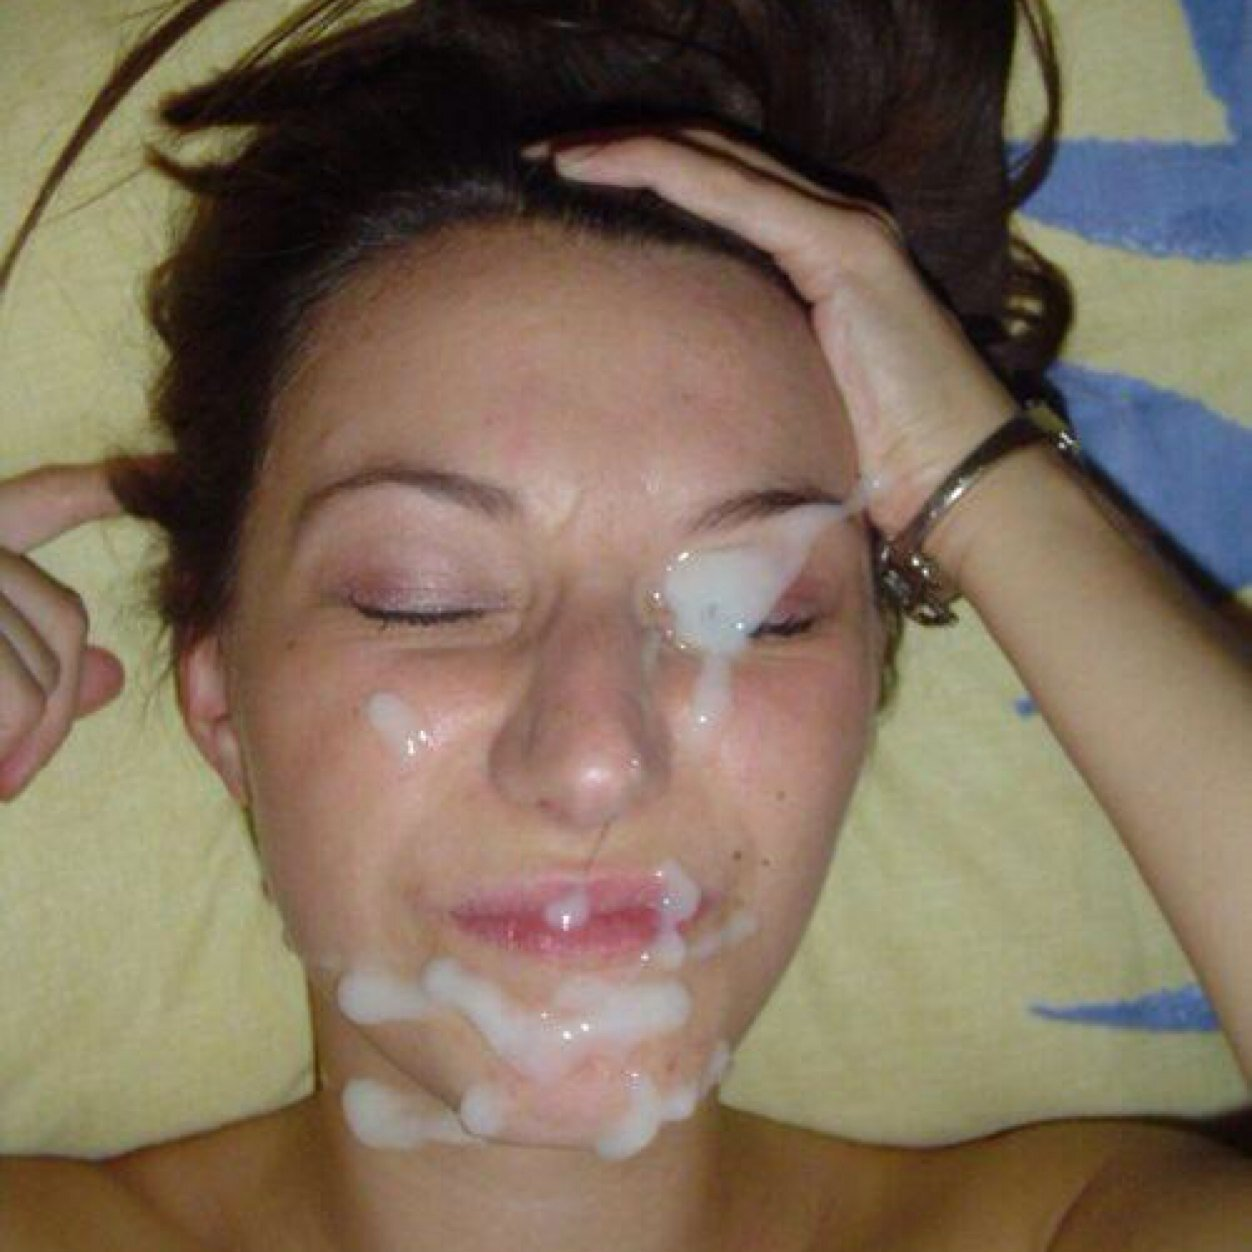 Спеерма на губах 6 фотография